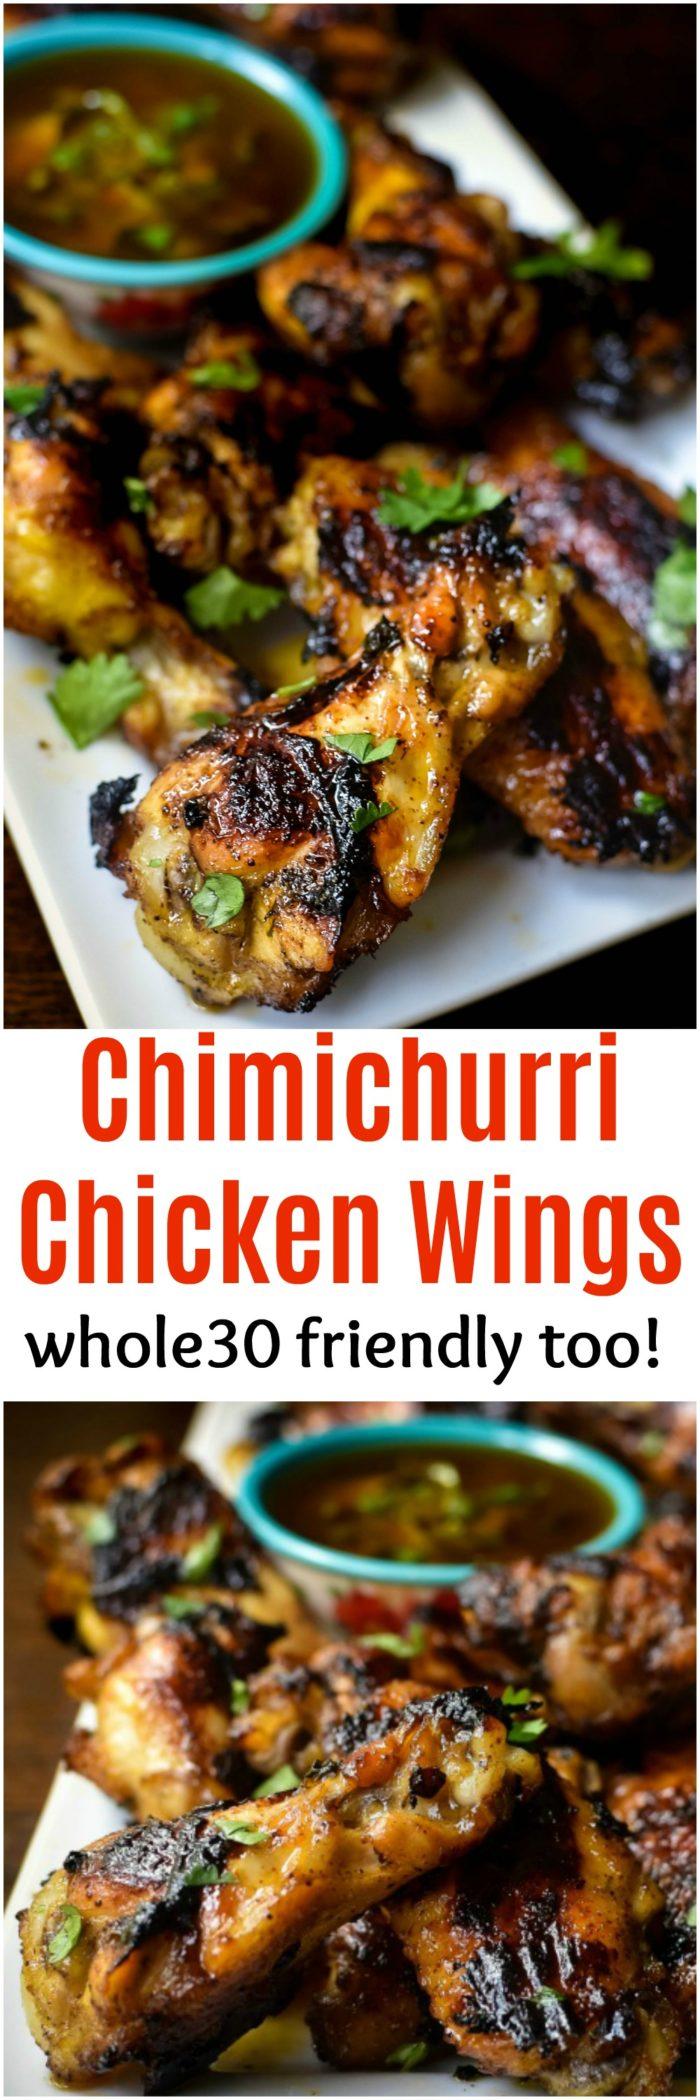 Chimichurri Chicken Wings - whole30 friendly too | MrsHappyHomemaker.com @MrsHappyHomemaker